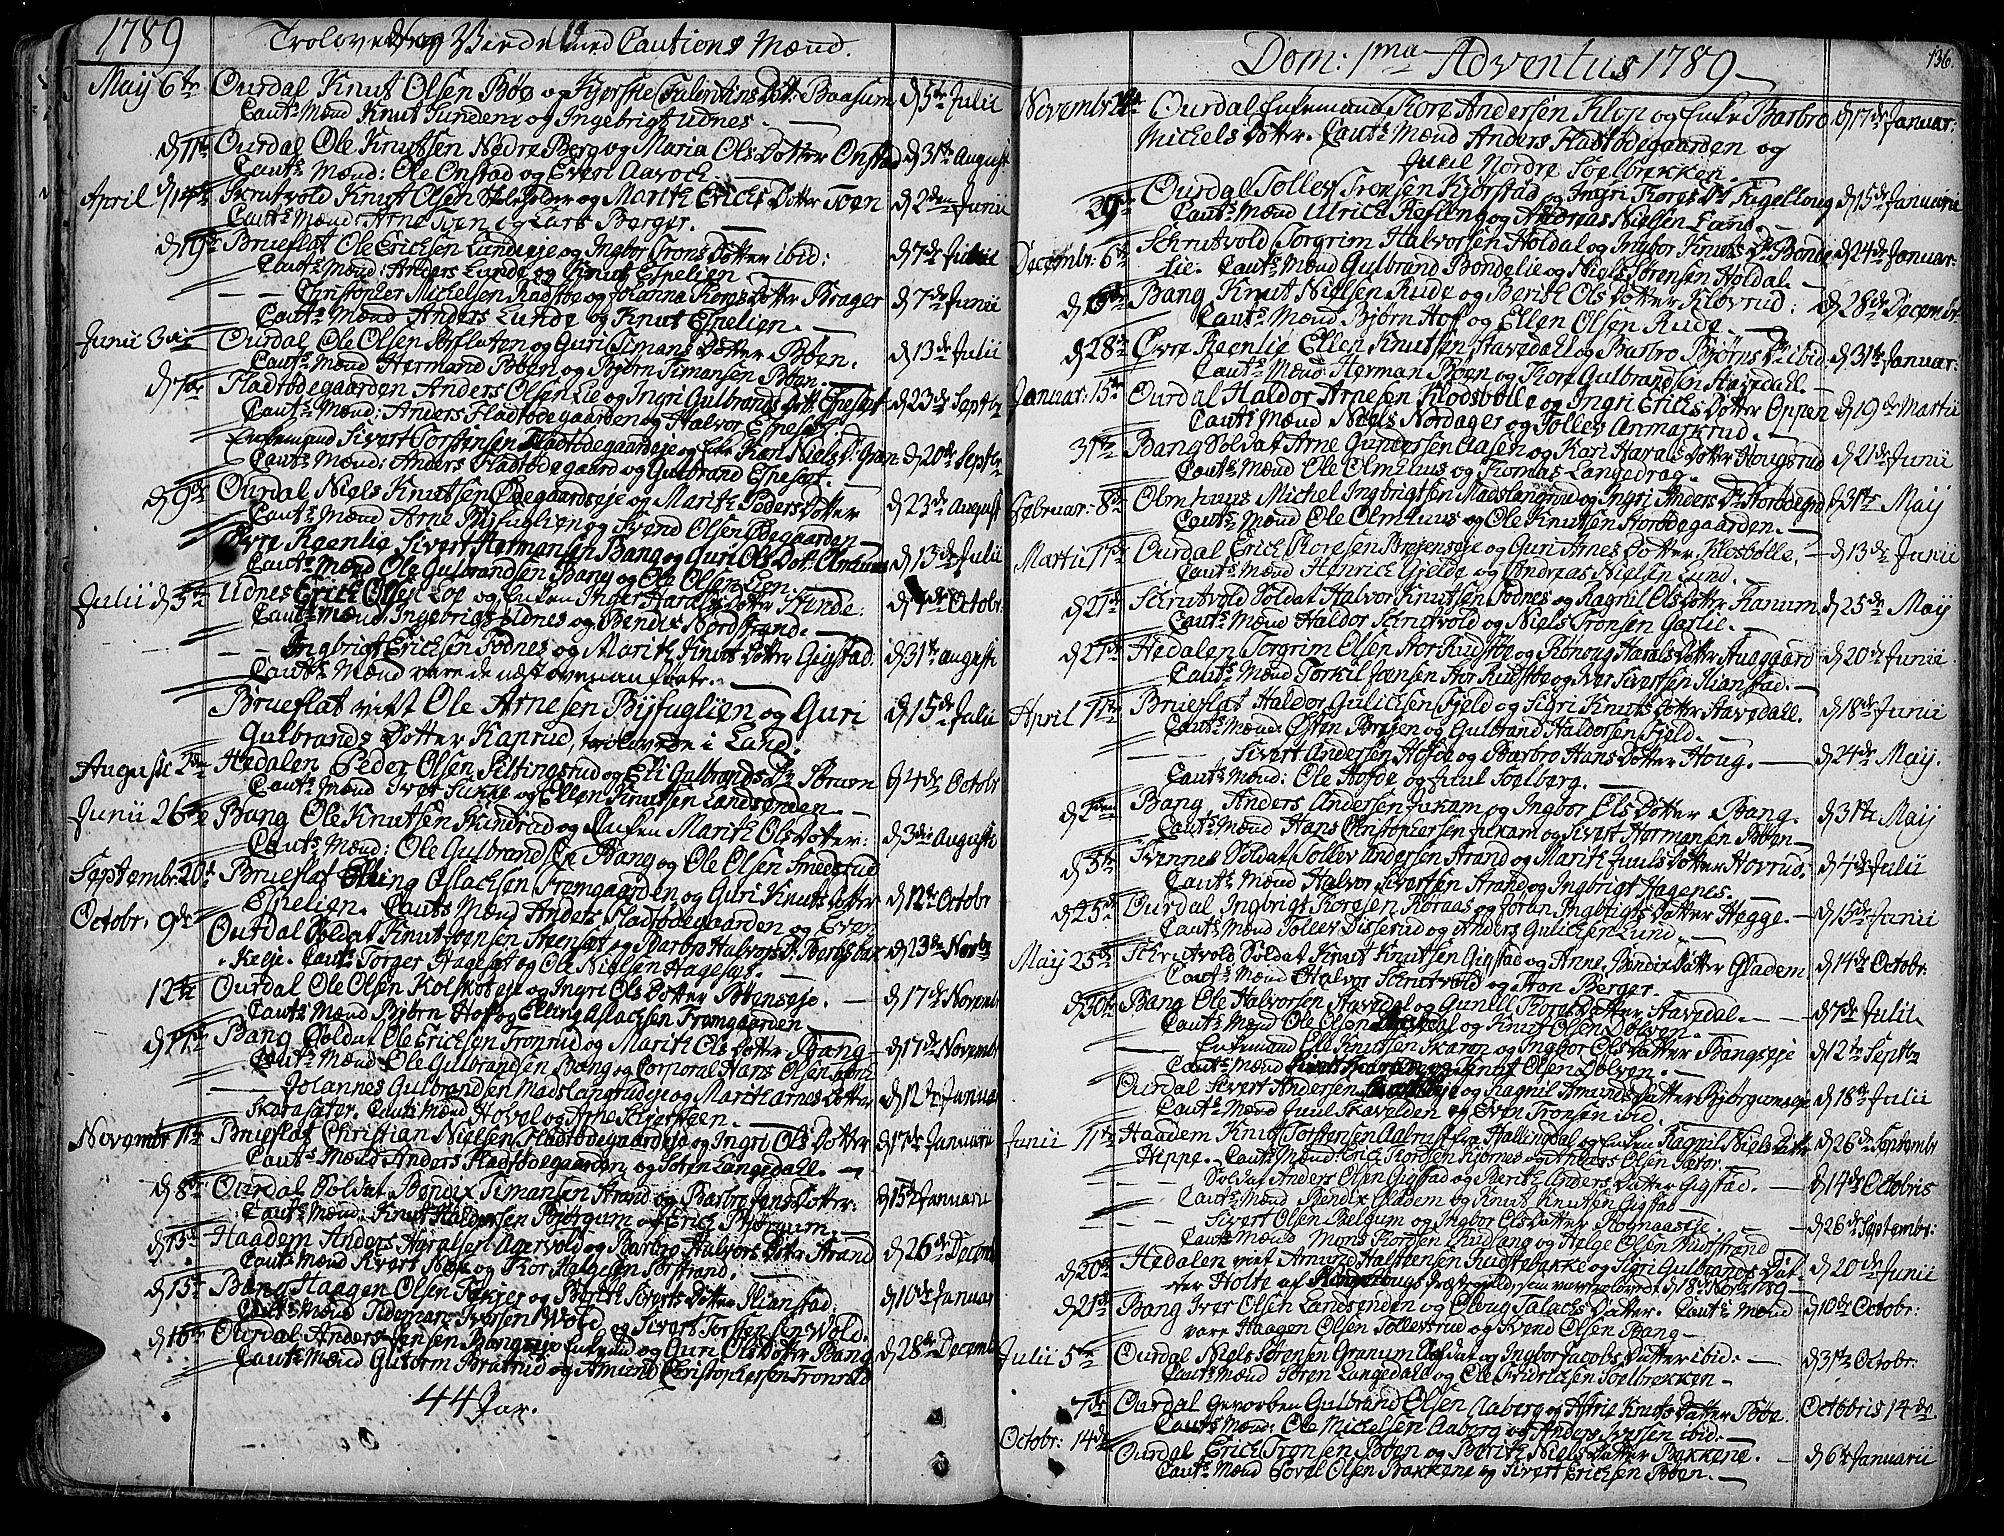 SAH, Aurdal prestekontor, Ministerialbok nr. 6, 1781-1804, s. 136